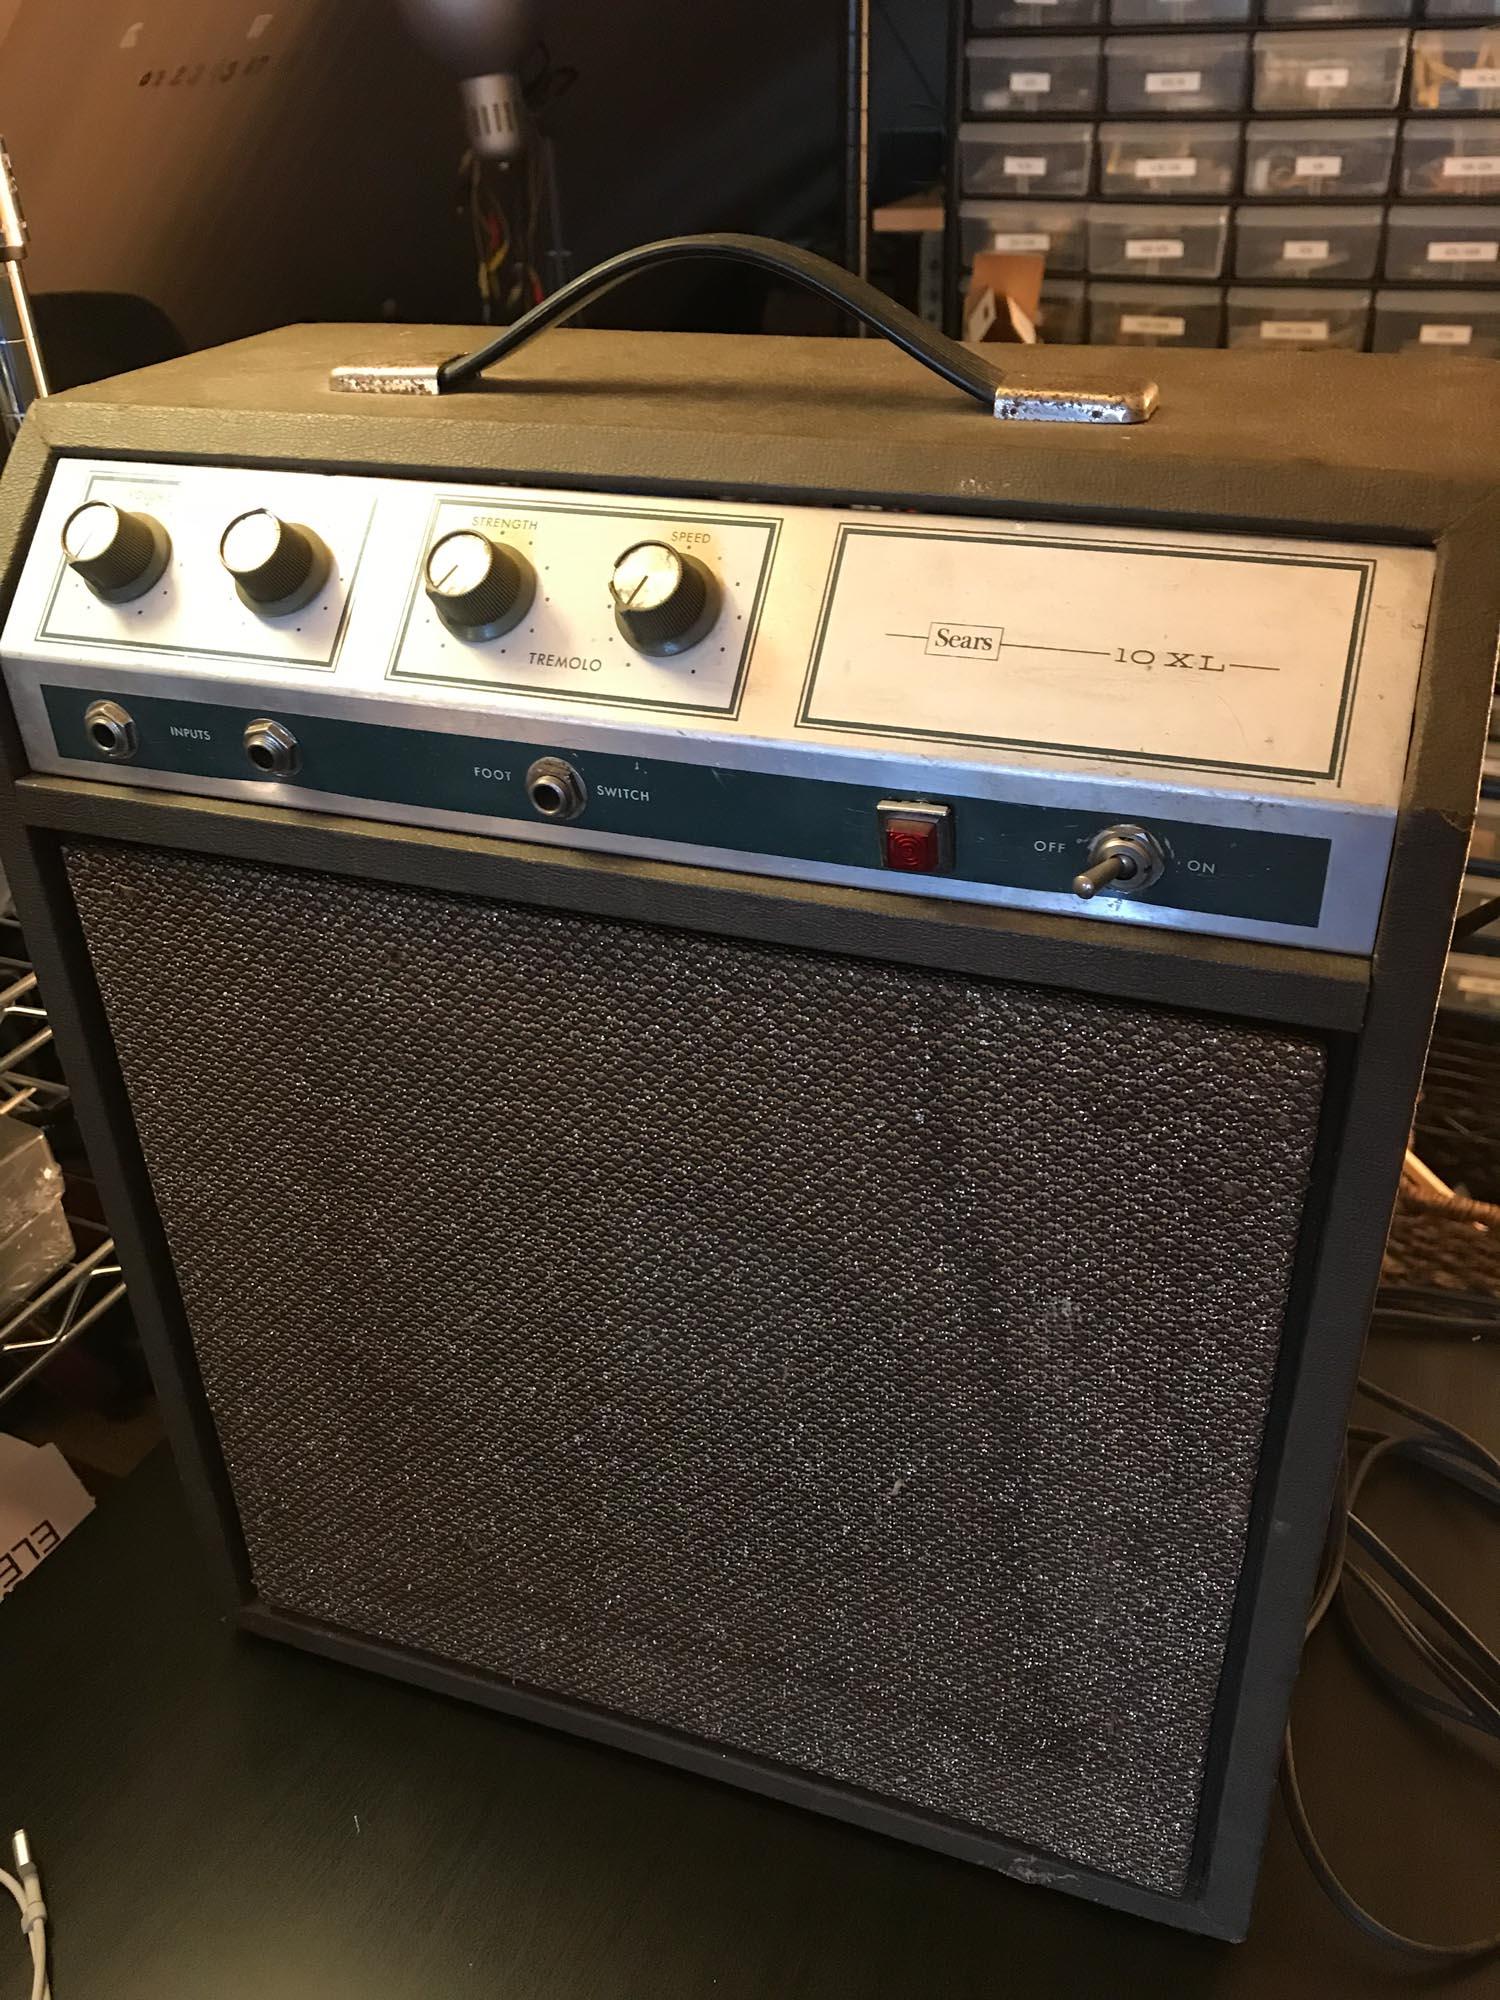 Silvertone 10XL Amp for Recap